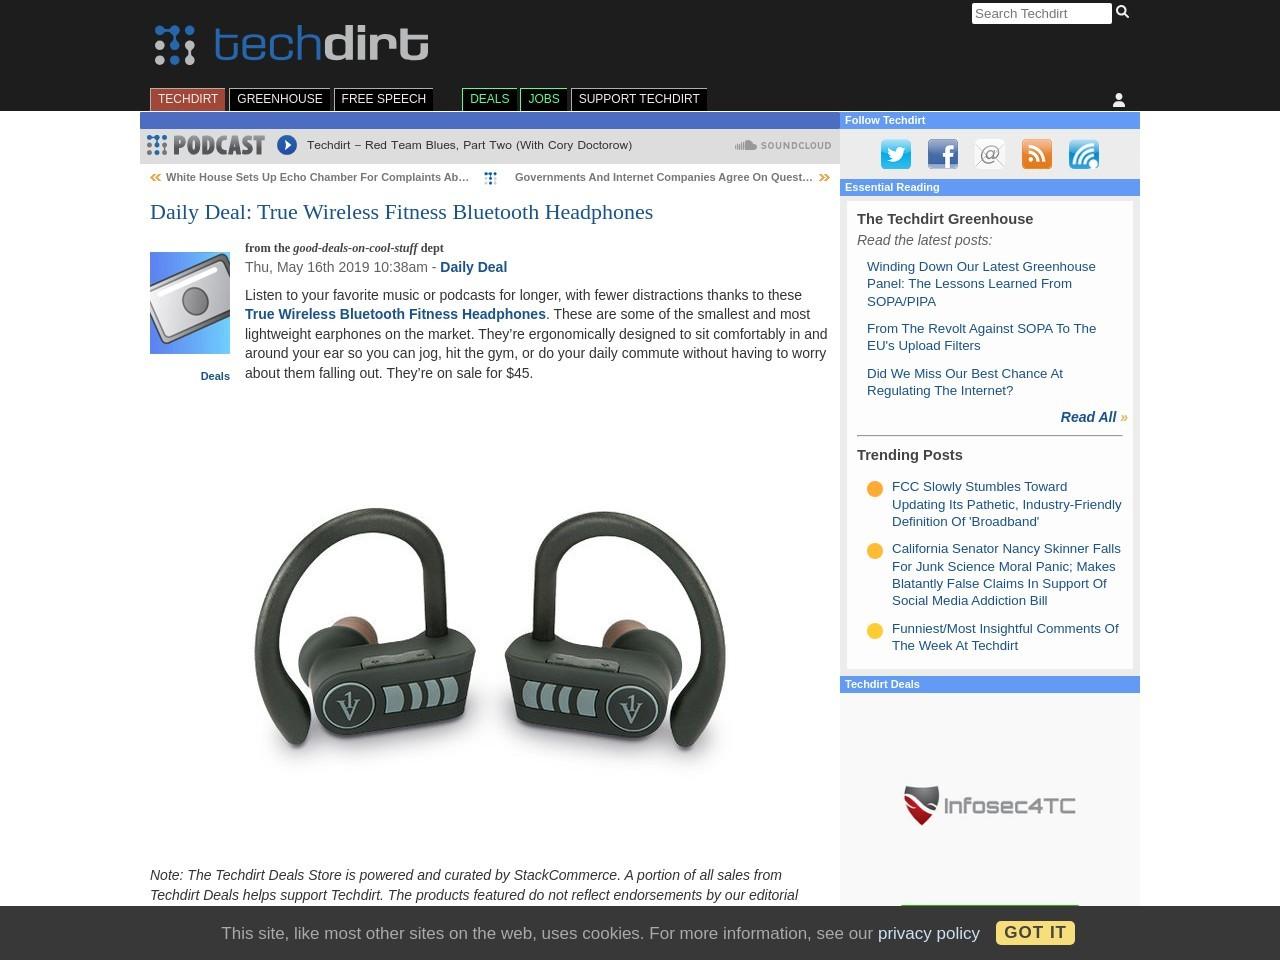 Daily Deal: True Wireless Fitness Bluetooth Headphones